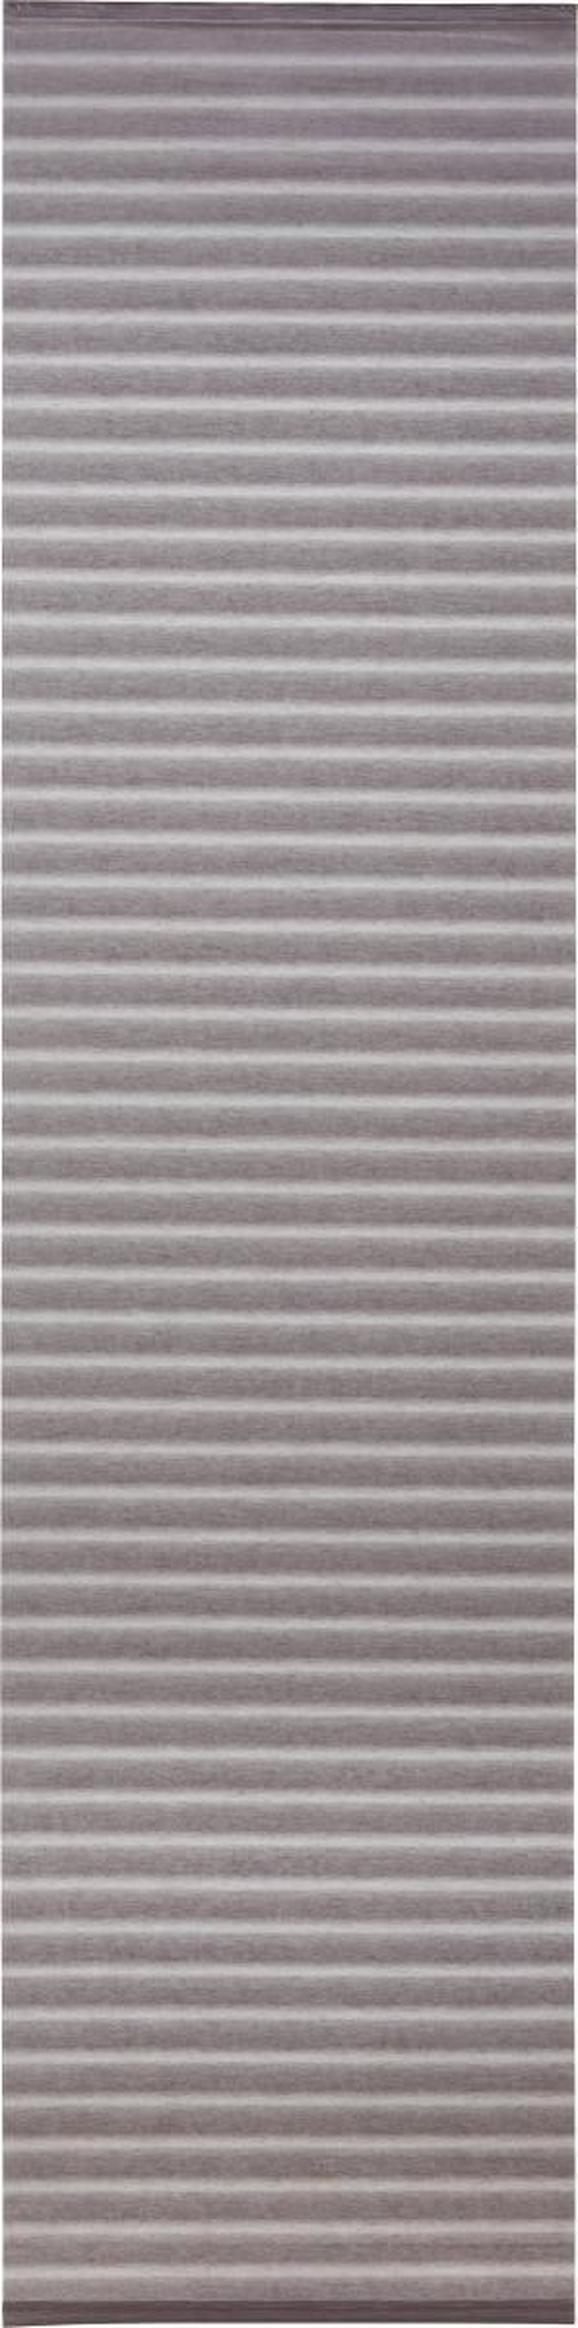 Flächenvorhang Flow Weiß 60x245cm - Weiß, MODERN, Textil (60/245cm) - Mömax modern living